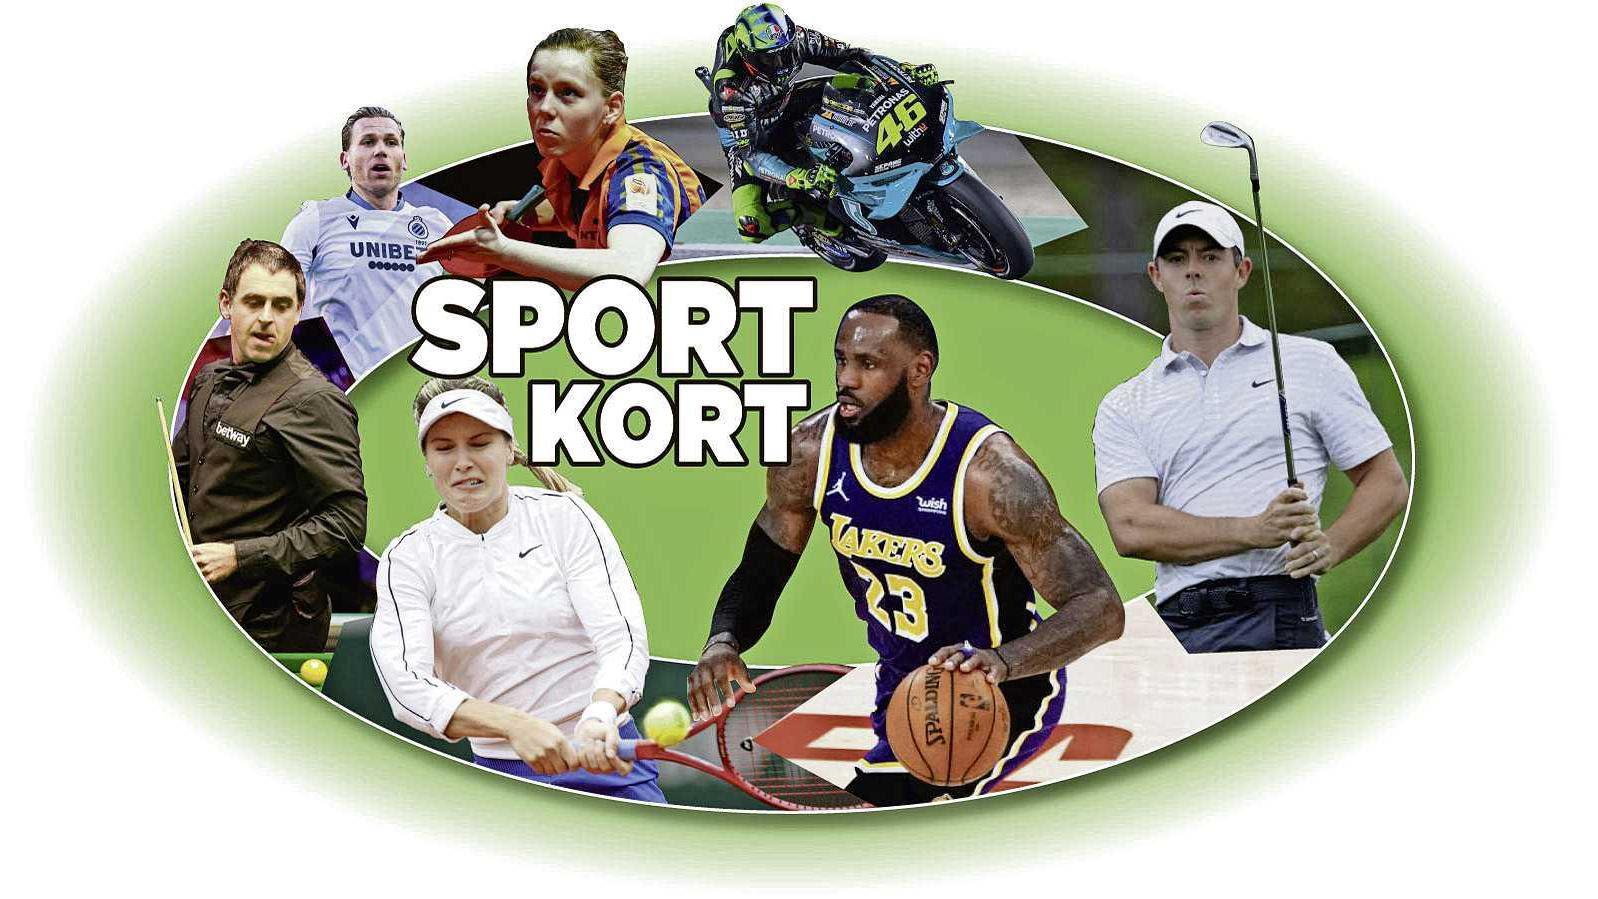 Sport Kort: Succes voor Femke Bol en Nadine Visser in Zwitserland